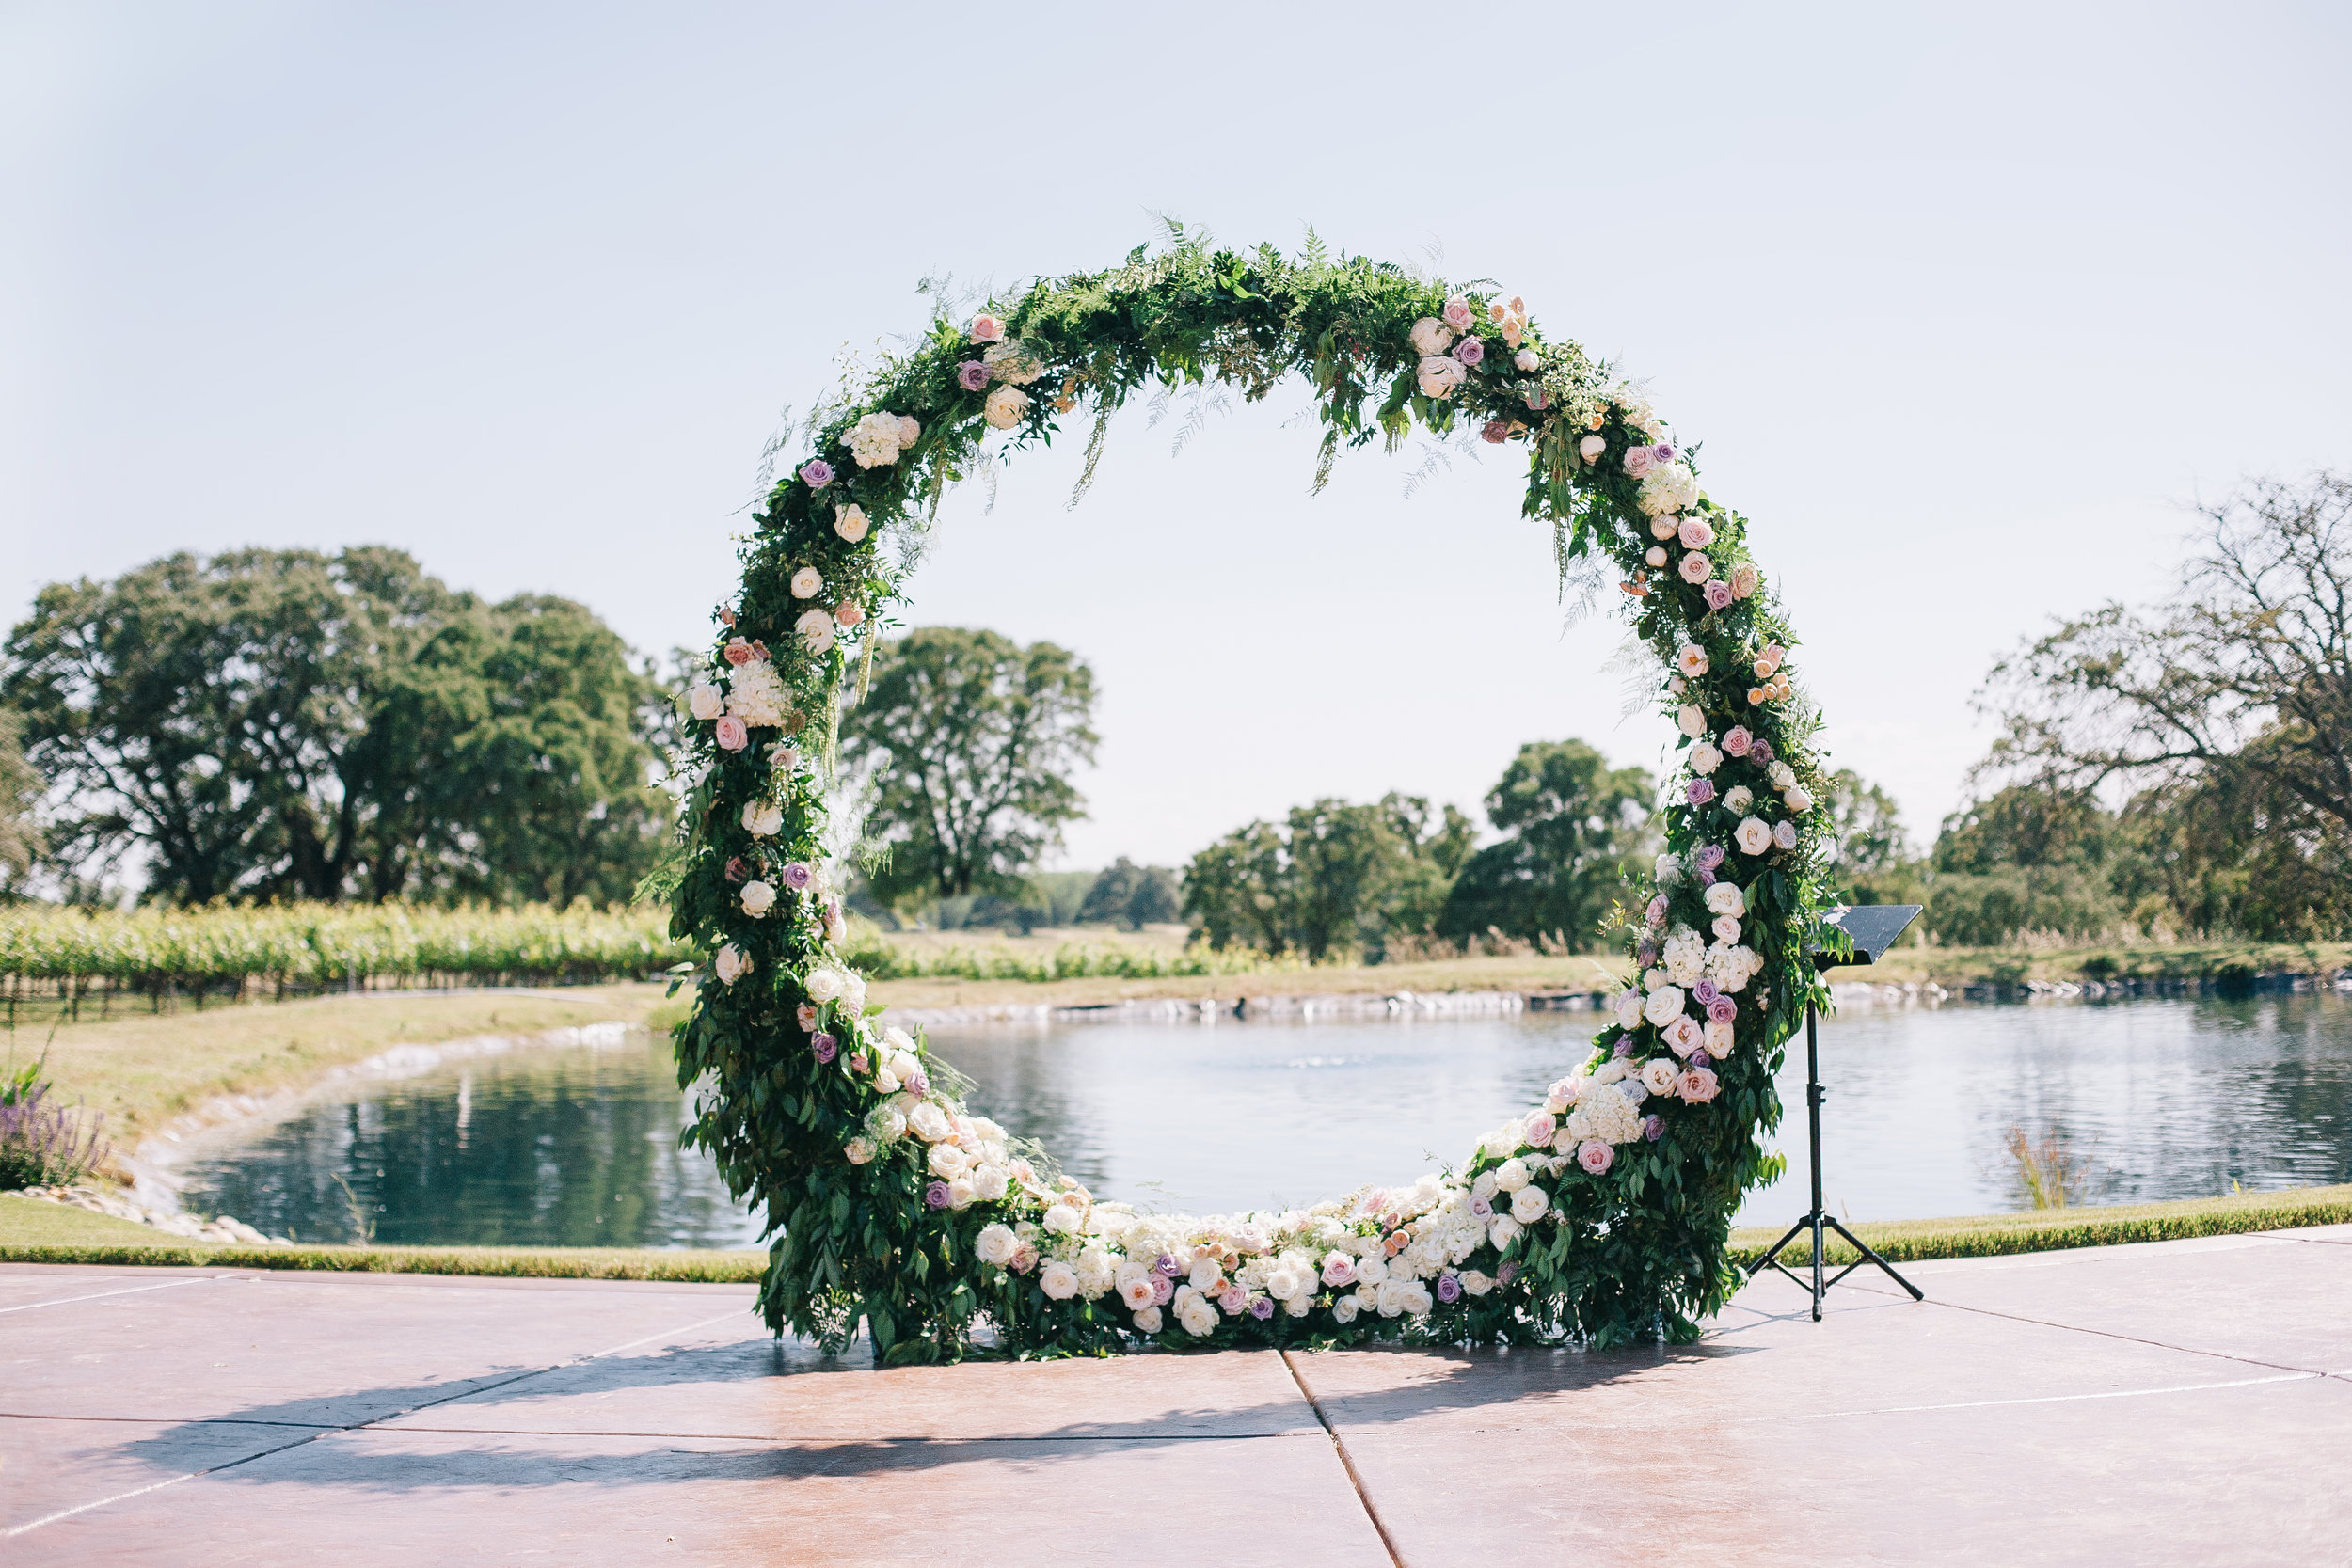 Violette-fleurs-event-design-roseville-anna-perevertaylo-rancho-robles-vinyards-Detail-Beautiful-Decor-Bliss-Florist-ceremony-infinity-ring.jpg